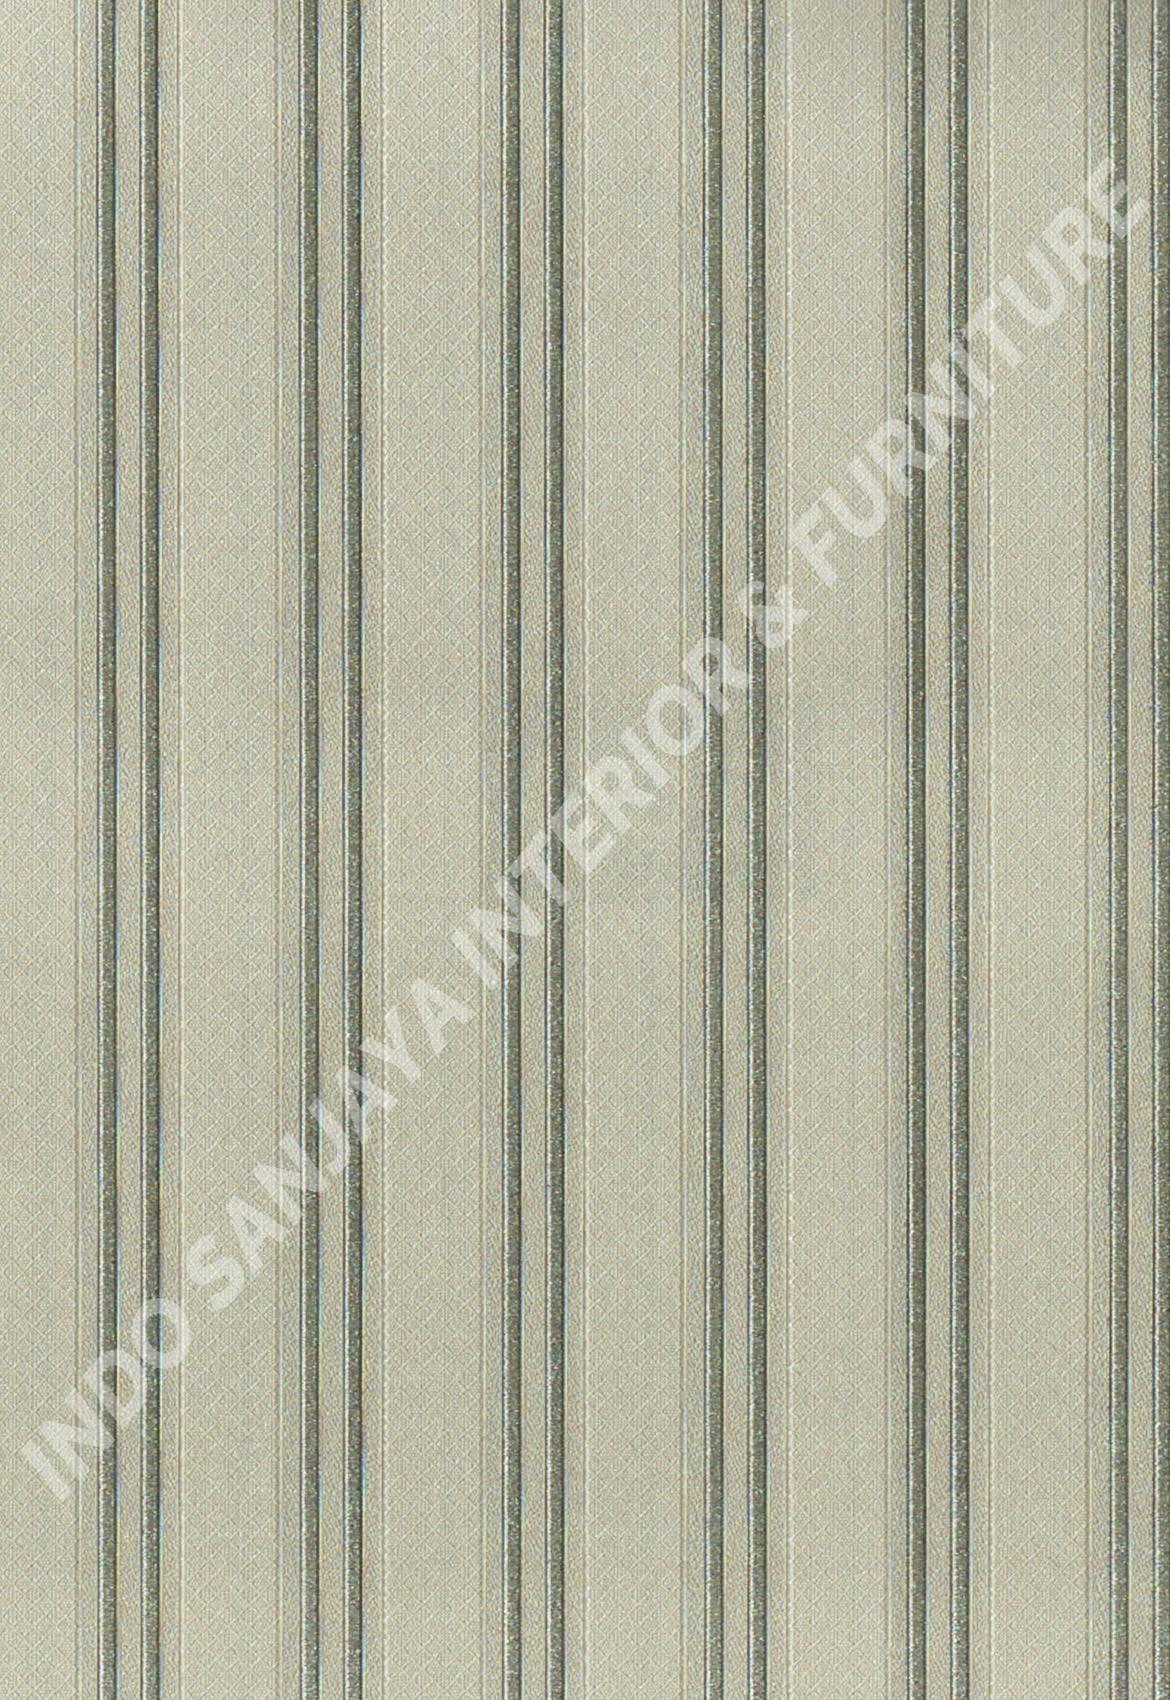 wallpaper   Wallpaper Minimalis Polos E10504:E10504 corak  warna